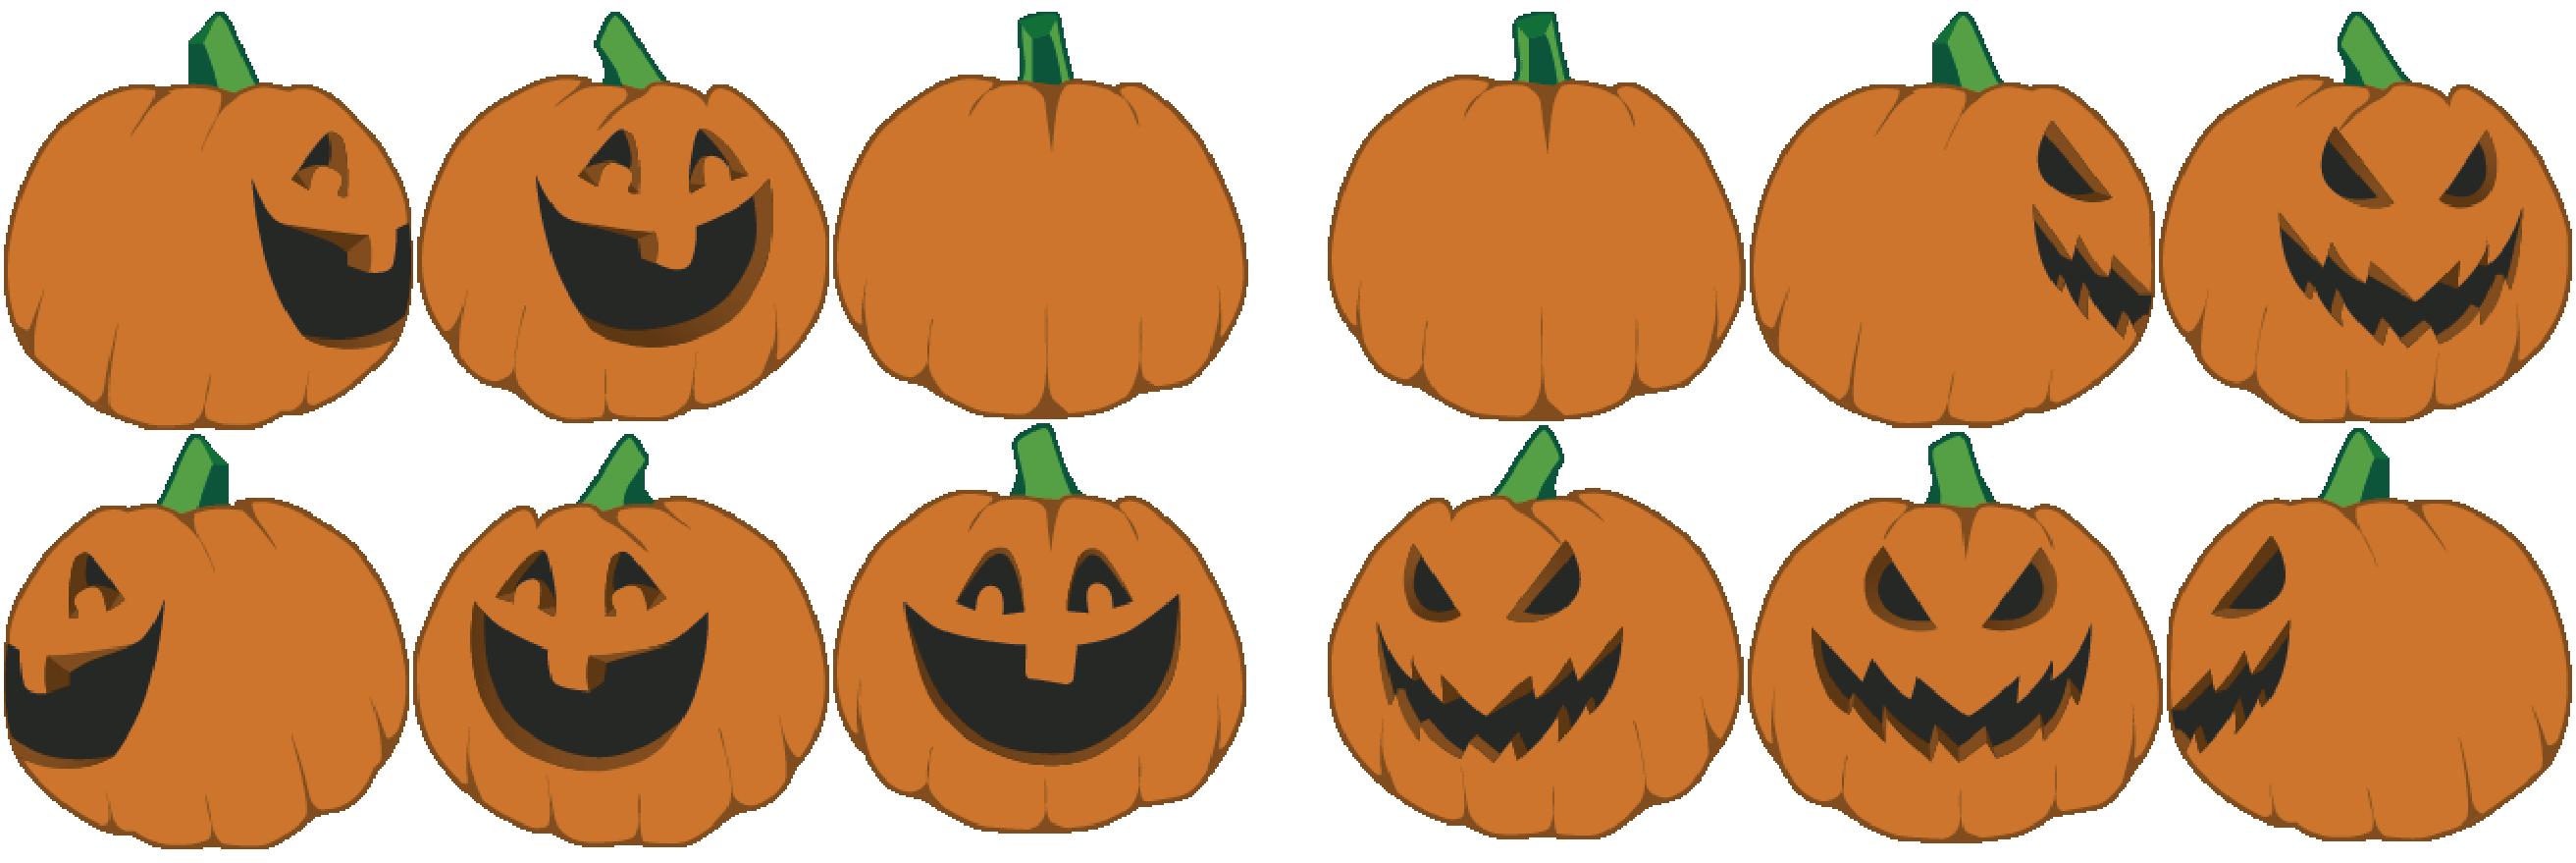 Pumpkin clipart jack o lantern sprite jpg royalty free library TUTORIAL jpg royalty free library